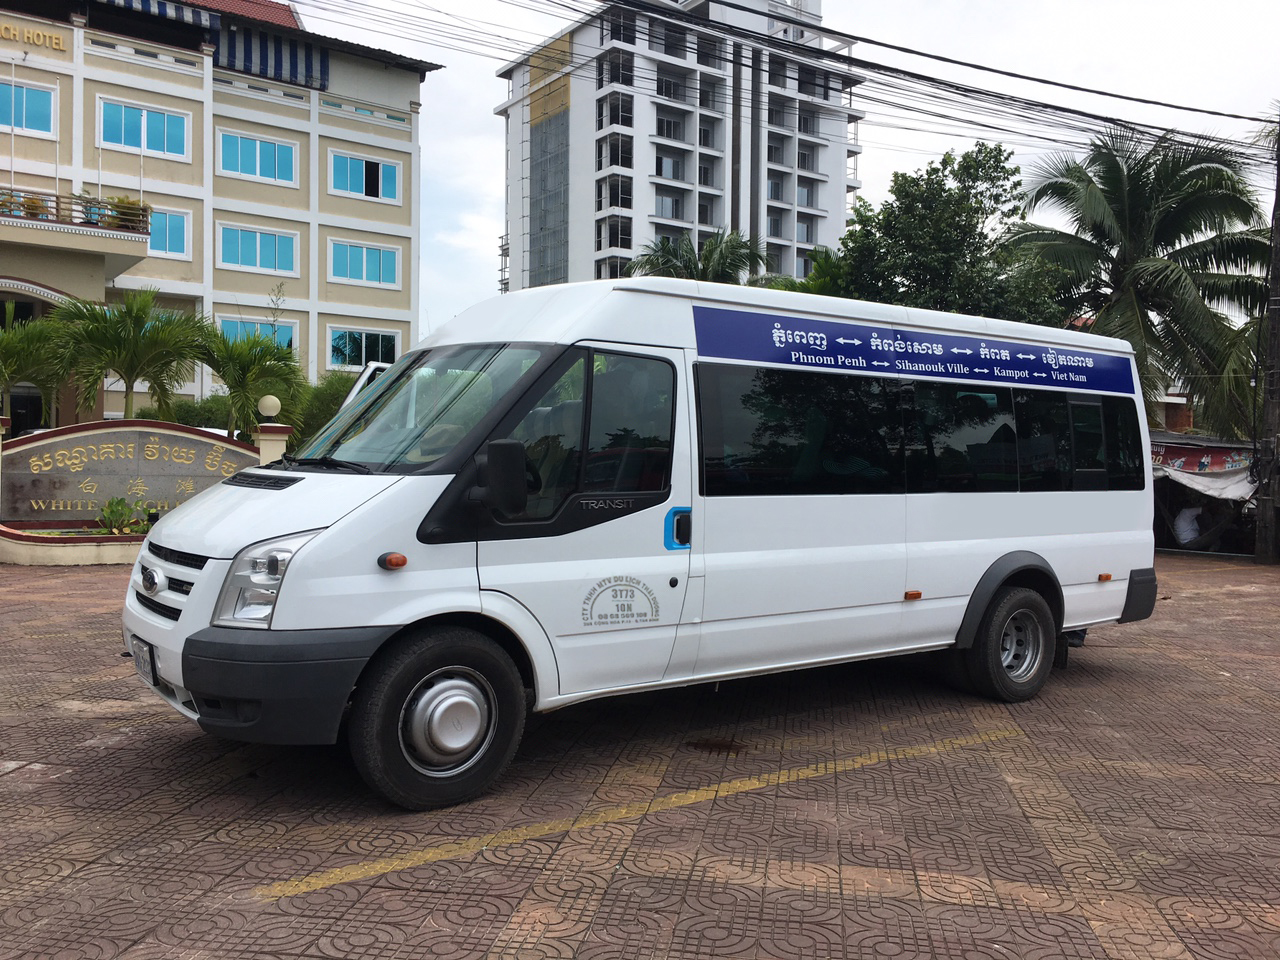 xe tdha tien di sihanoukville 1 1 1 - Thuê xe đi Sihanouk Ville từ Hà Tiên